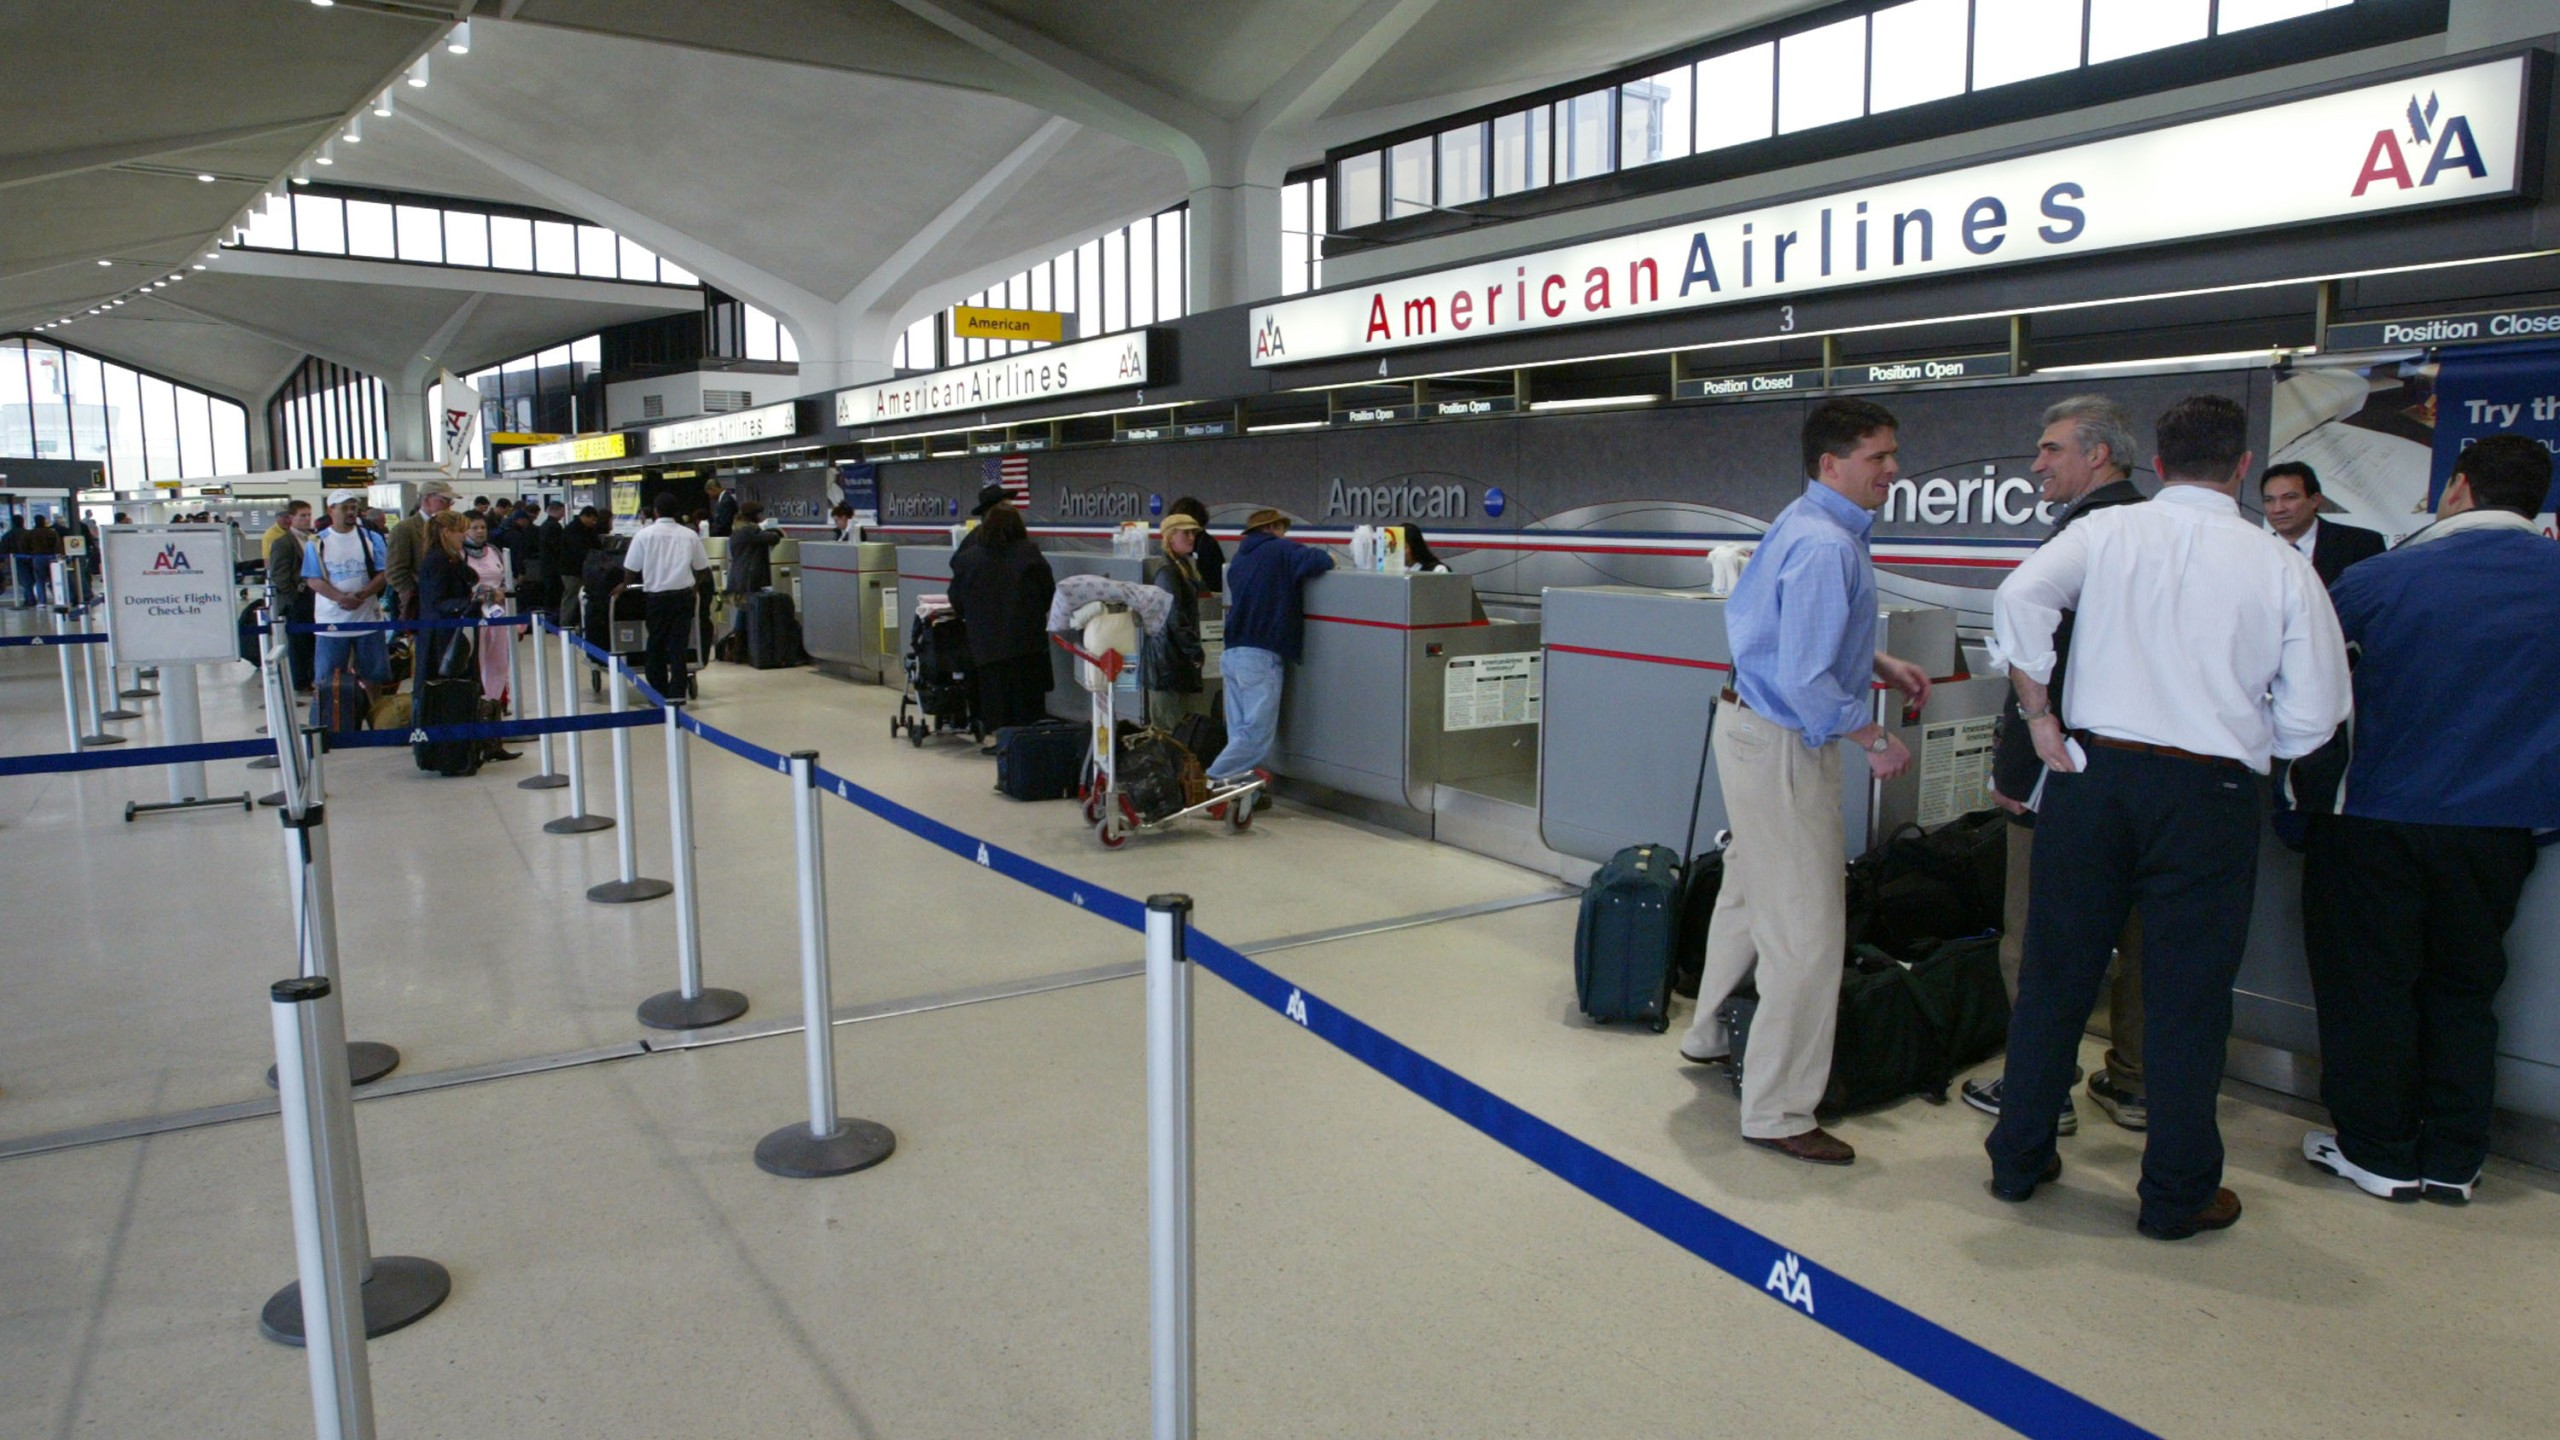 Passengers wait at a ticket counter at Newark Liberty International Airport on April 3, 2003. (Credit: Matthew Peyton/Getty Images)